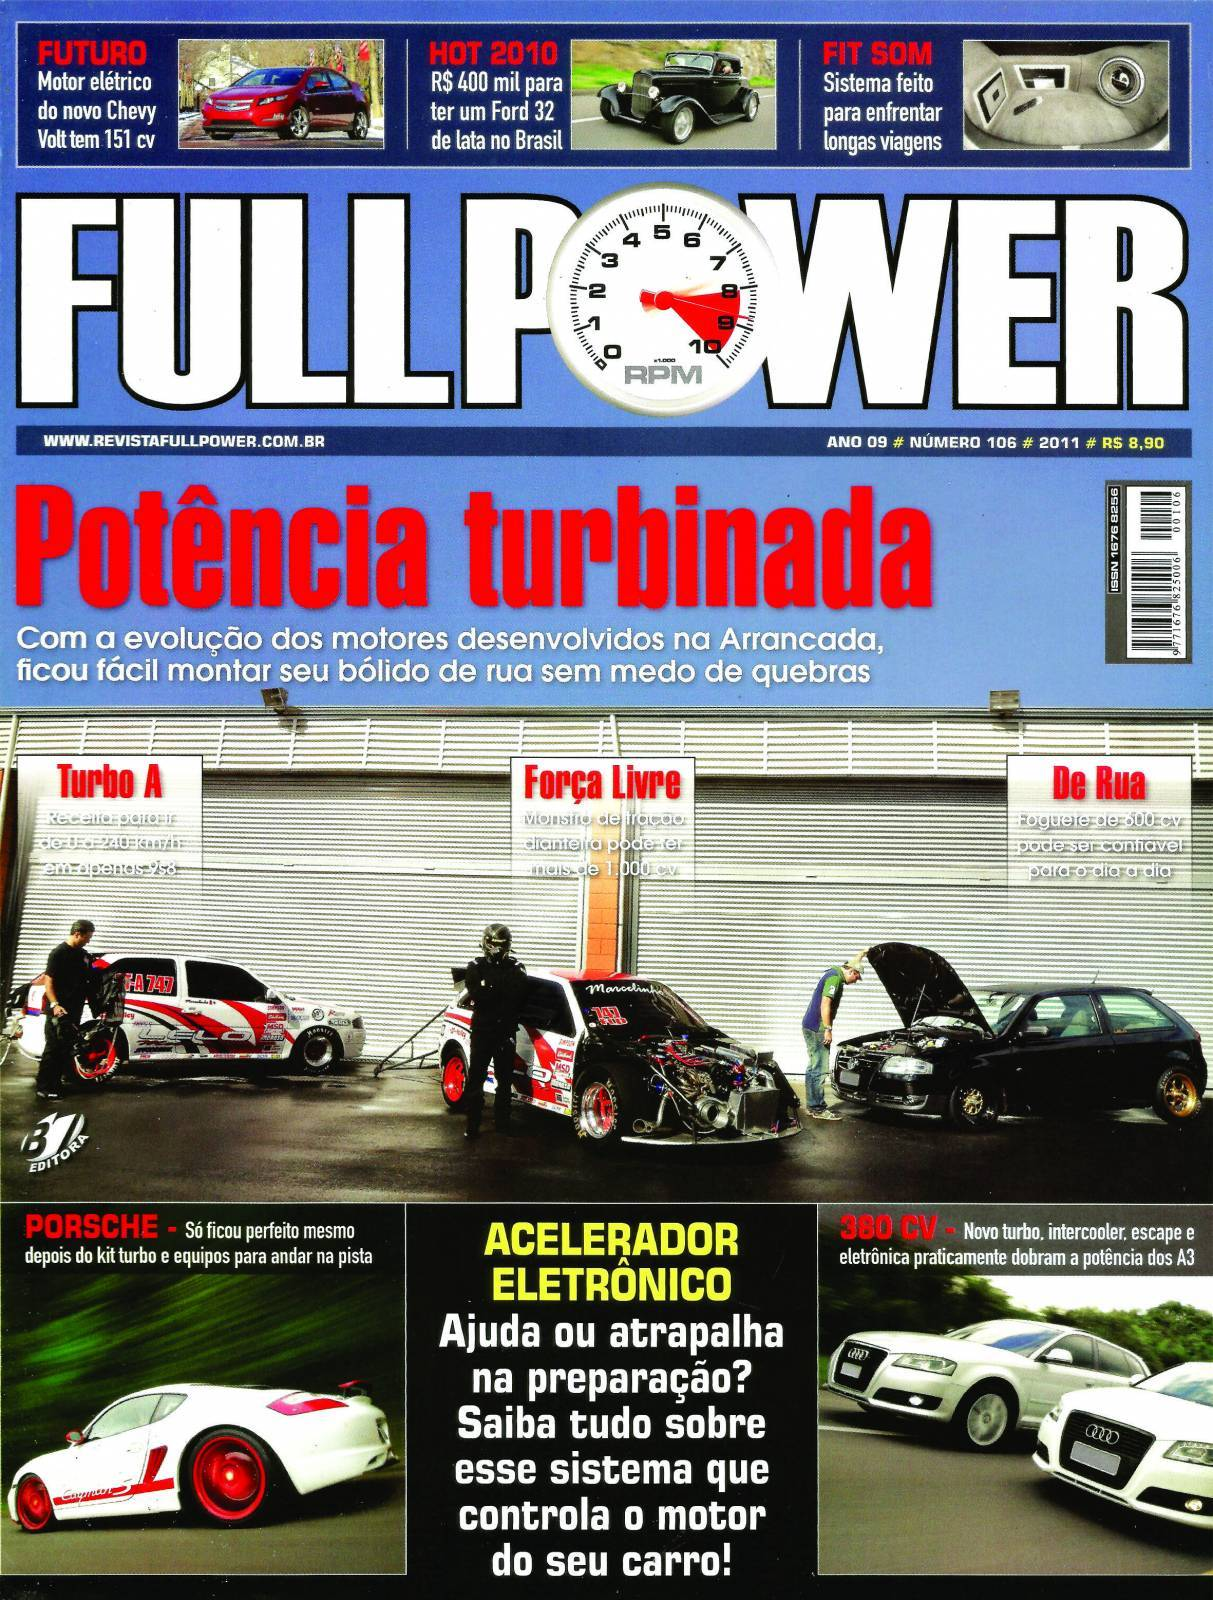 REVISTA FULLPOWER No. 106 ANO 2011 - Loja FullPower